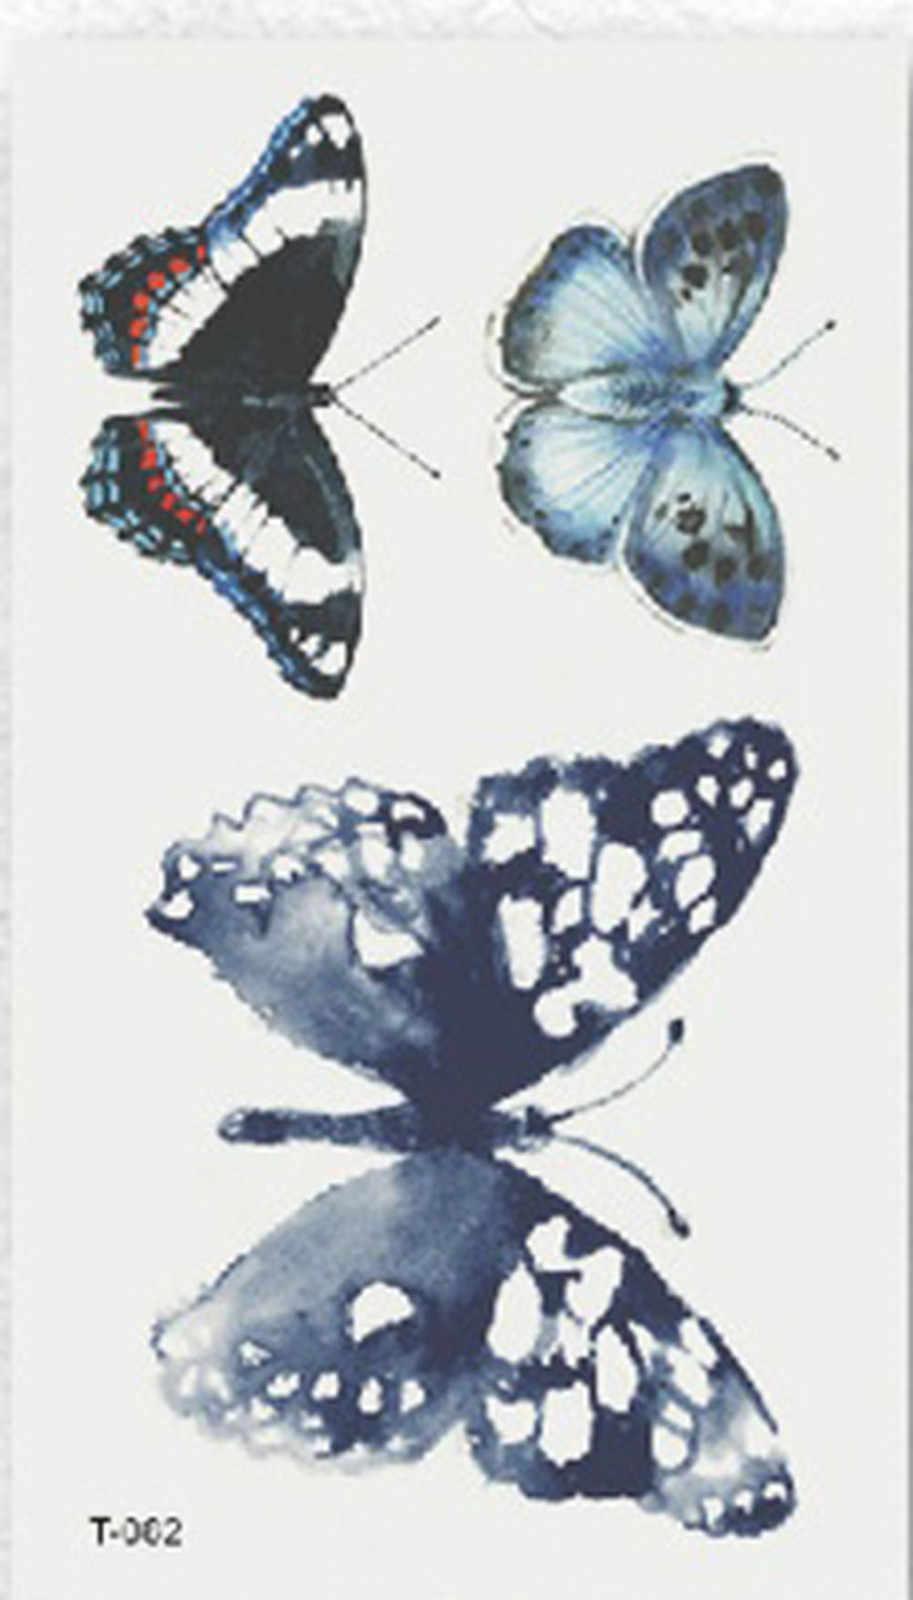 1Sheet  Watercolor Butterfly Temporary Tattoo Sticker Waterproof Women Fake Tattoos Men Children Body Art Hot Design  S11